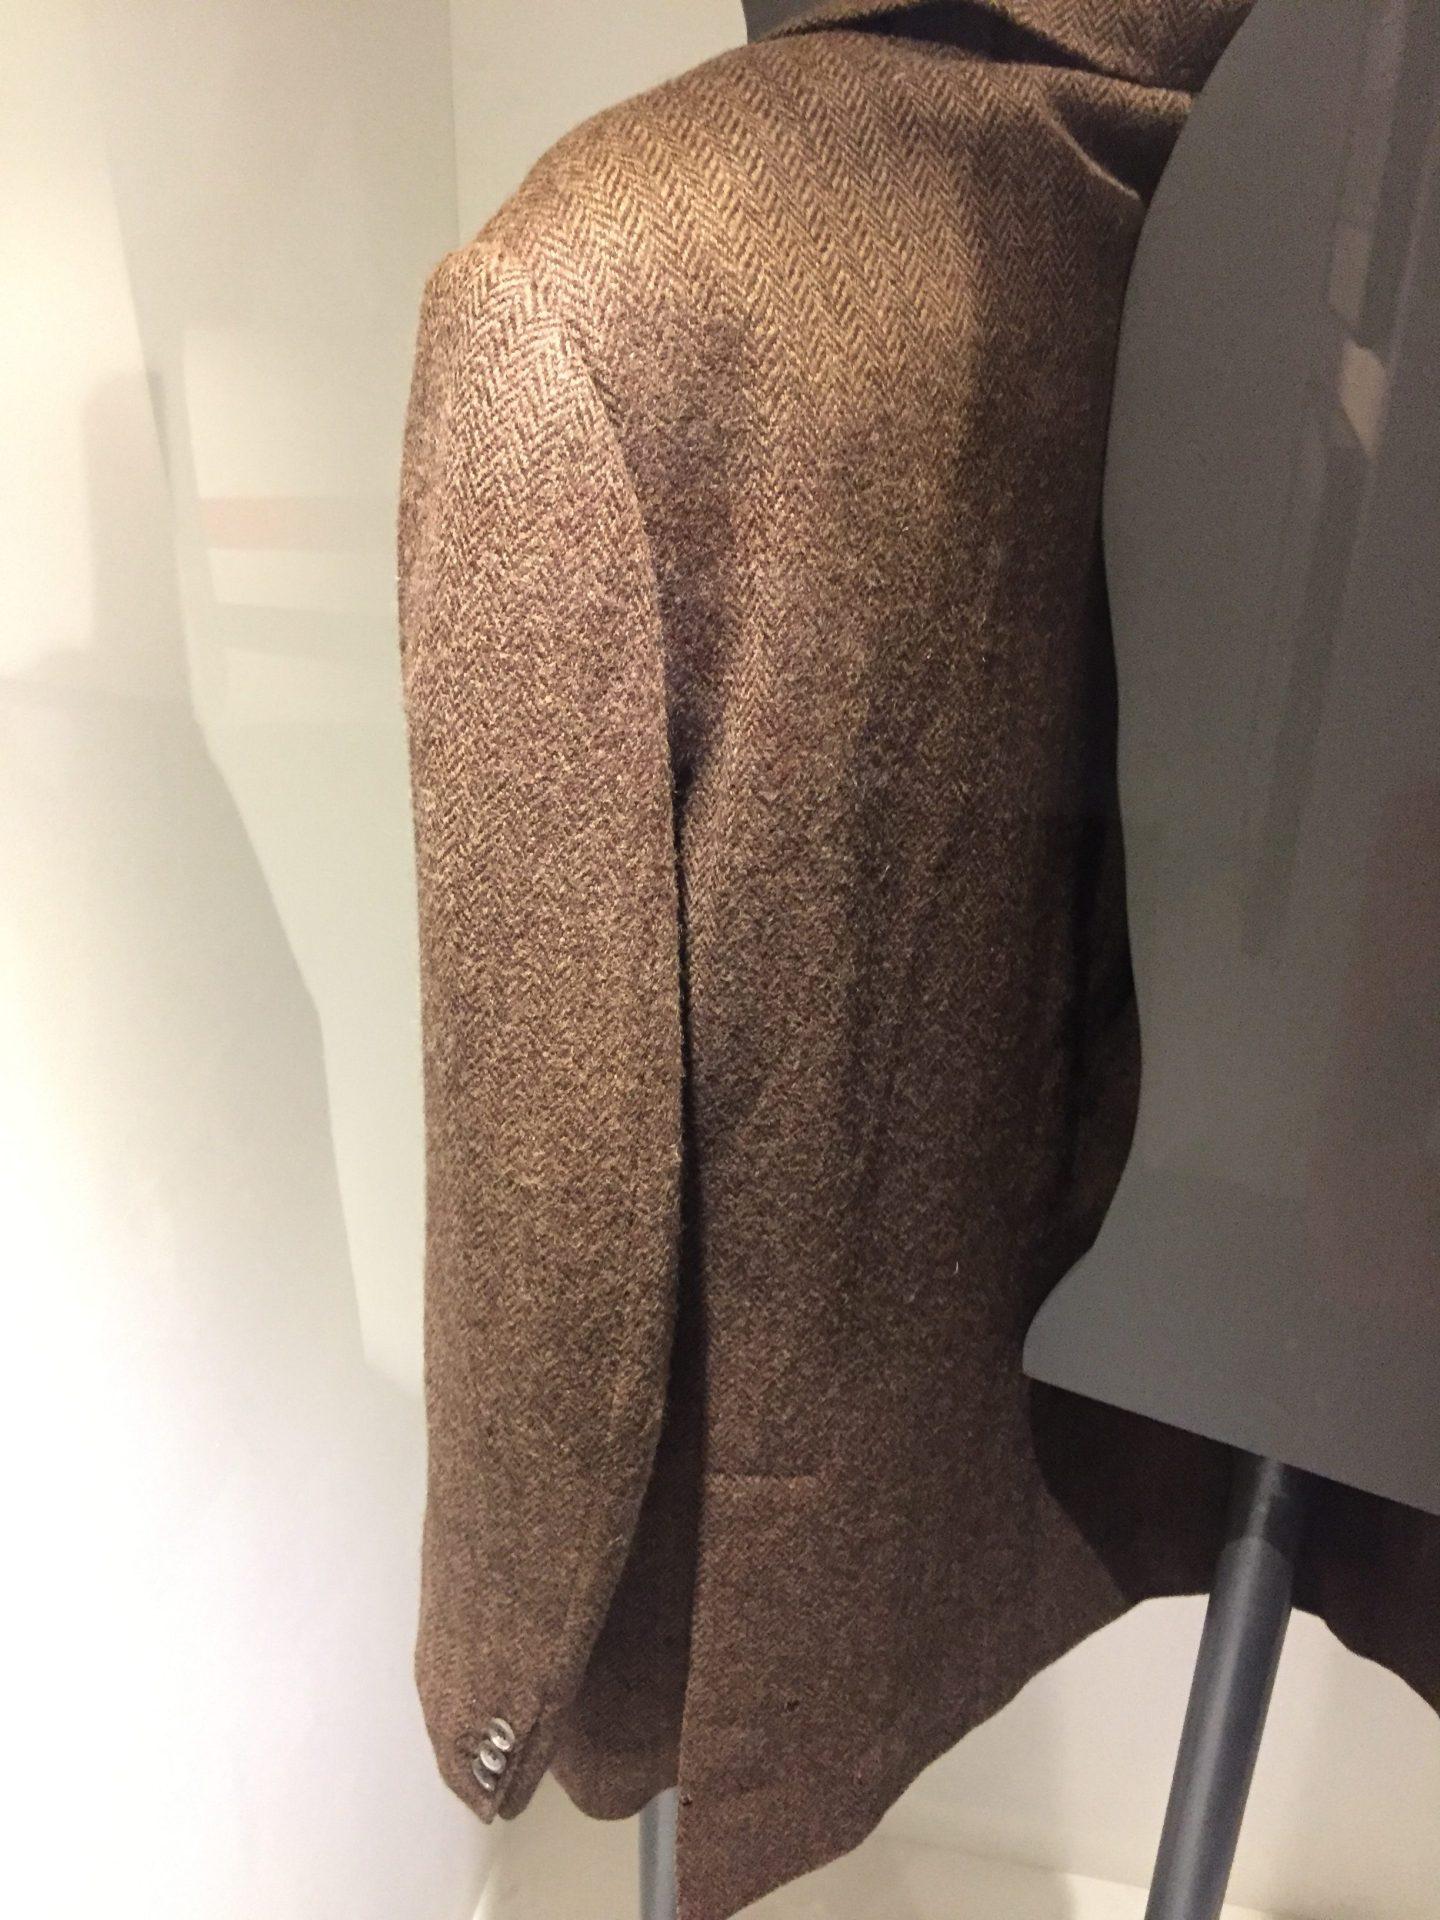 Herringbone pattern on the reversible military jacket